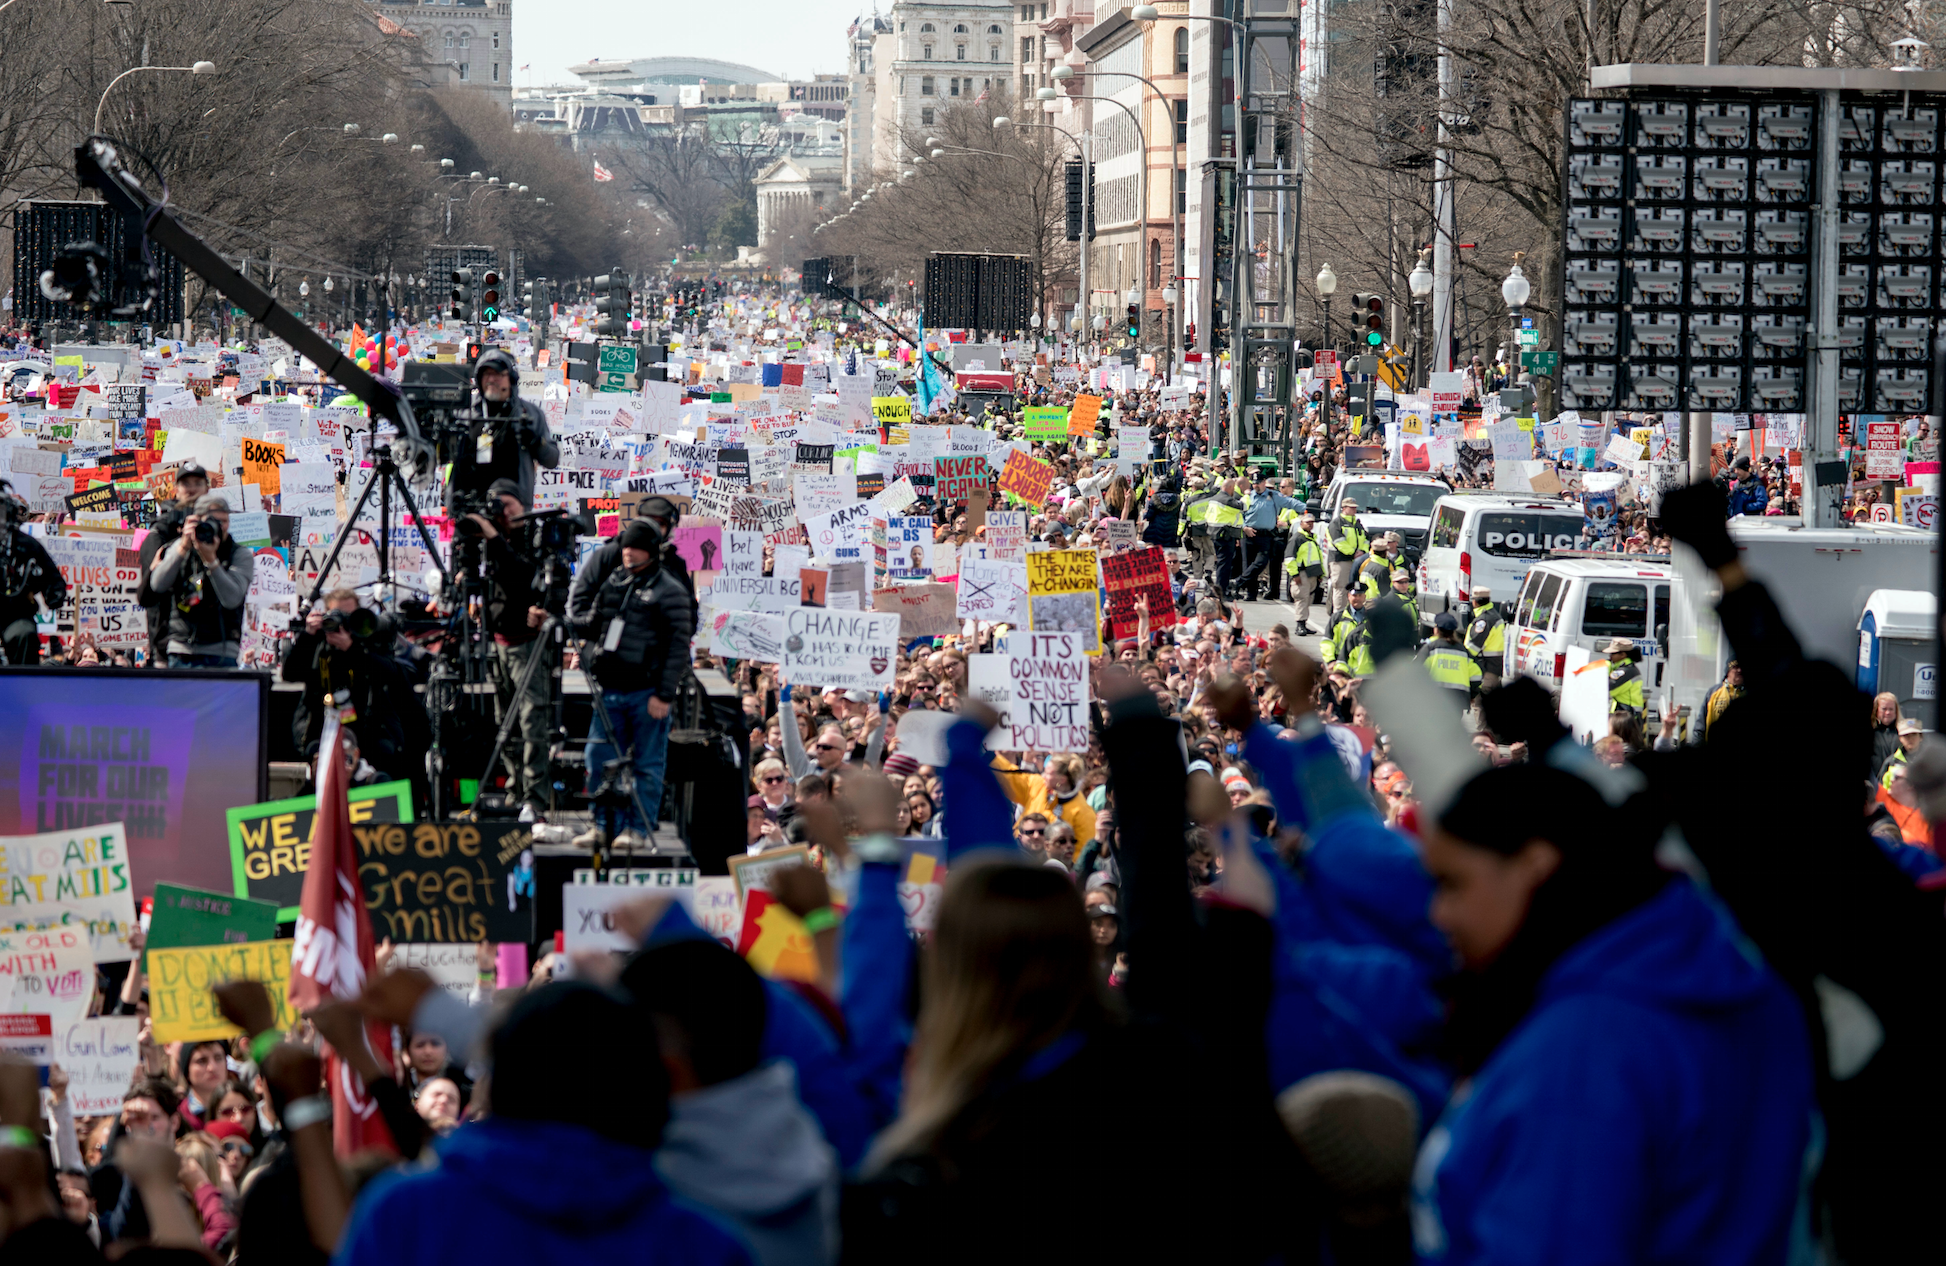 Paul McCartney attends anti-gun march in remembrance of John Lennon